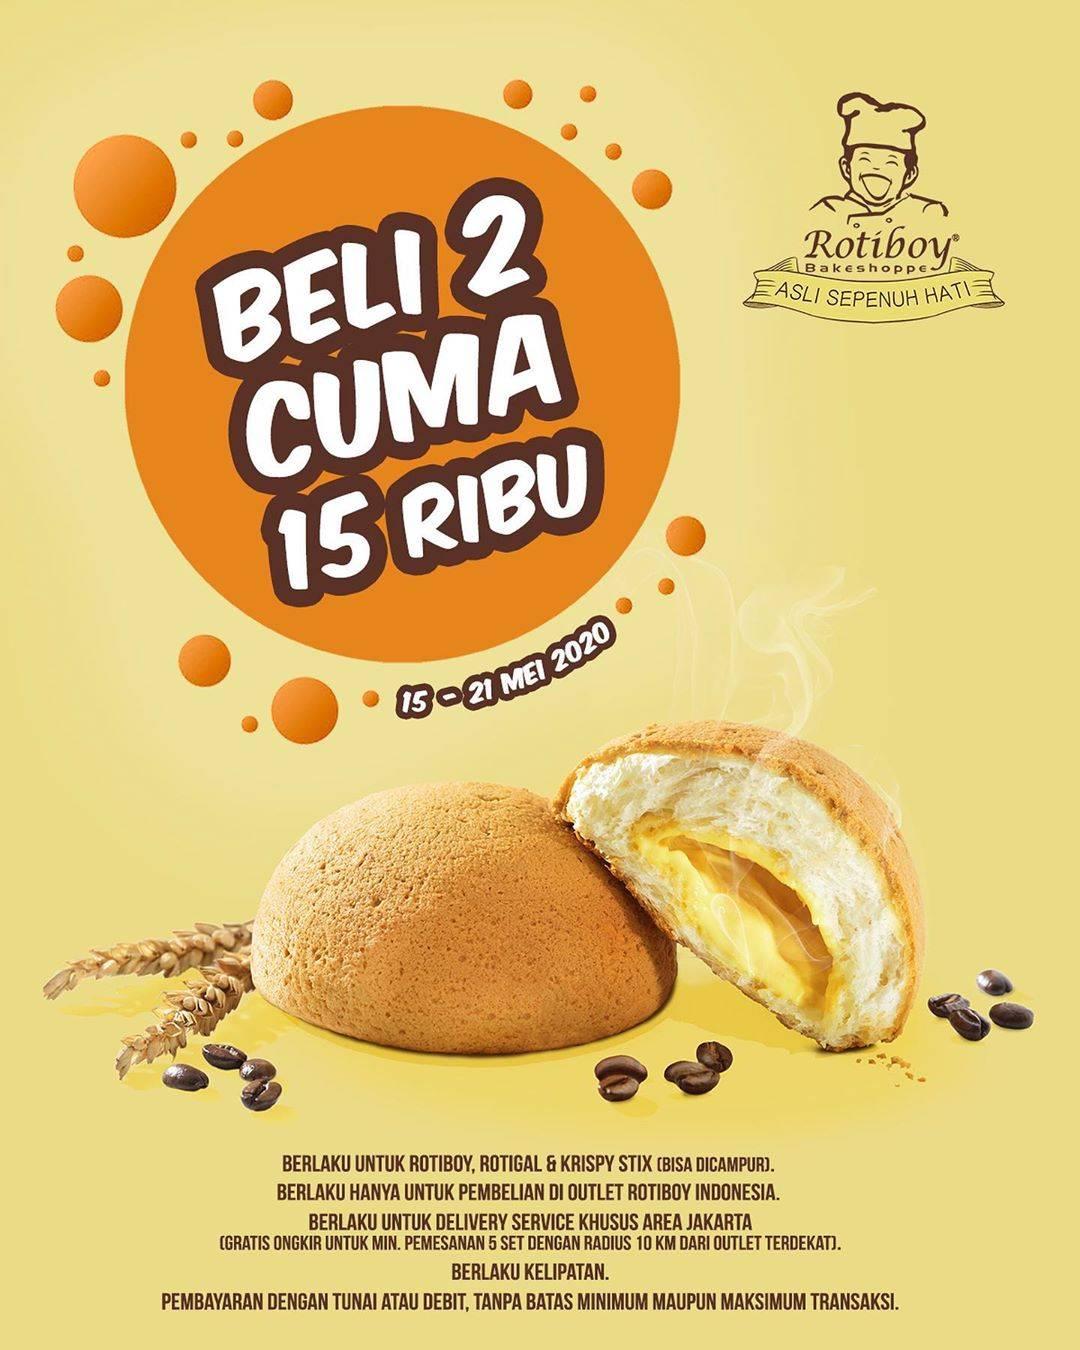 Diskon Roti Boy Promo Beli 2 RotiBoy/ Rotigal/ Krispy Stix Cuma Rp. 15.000